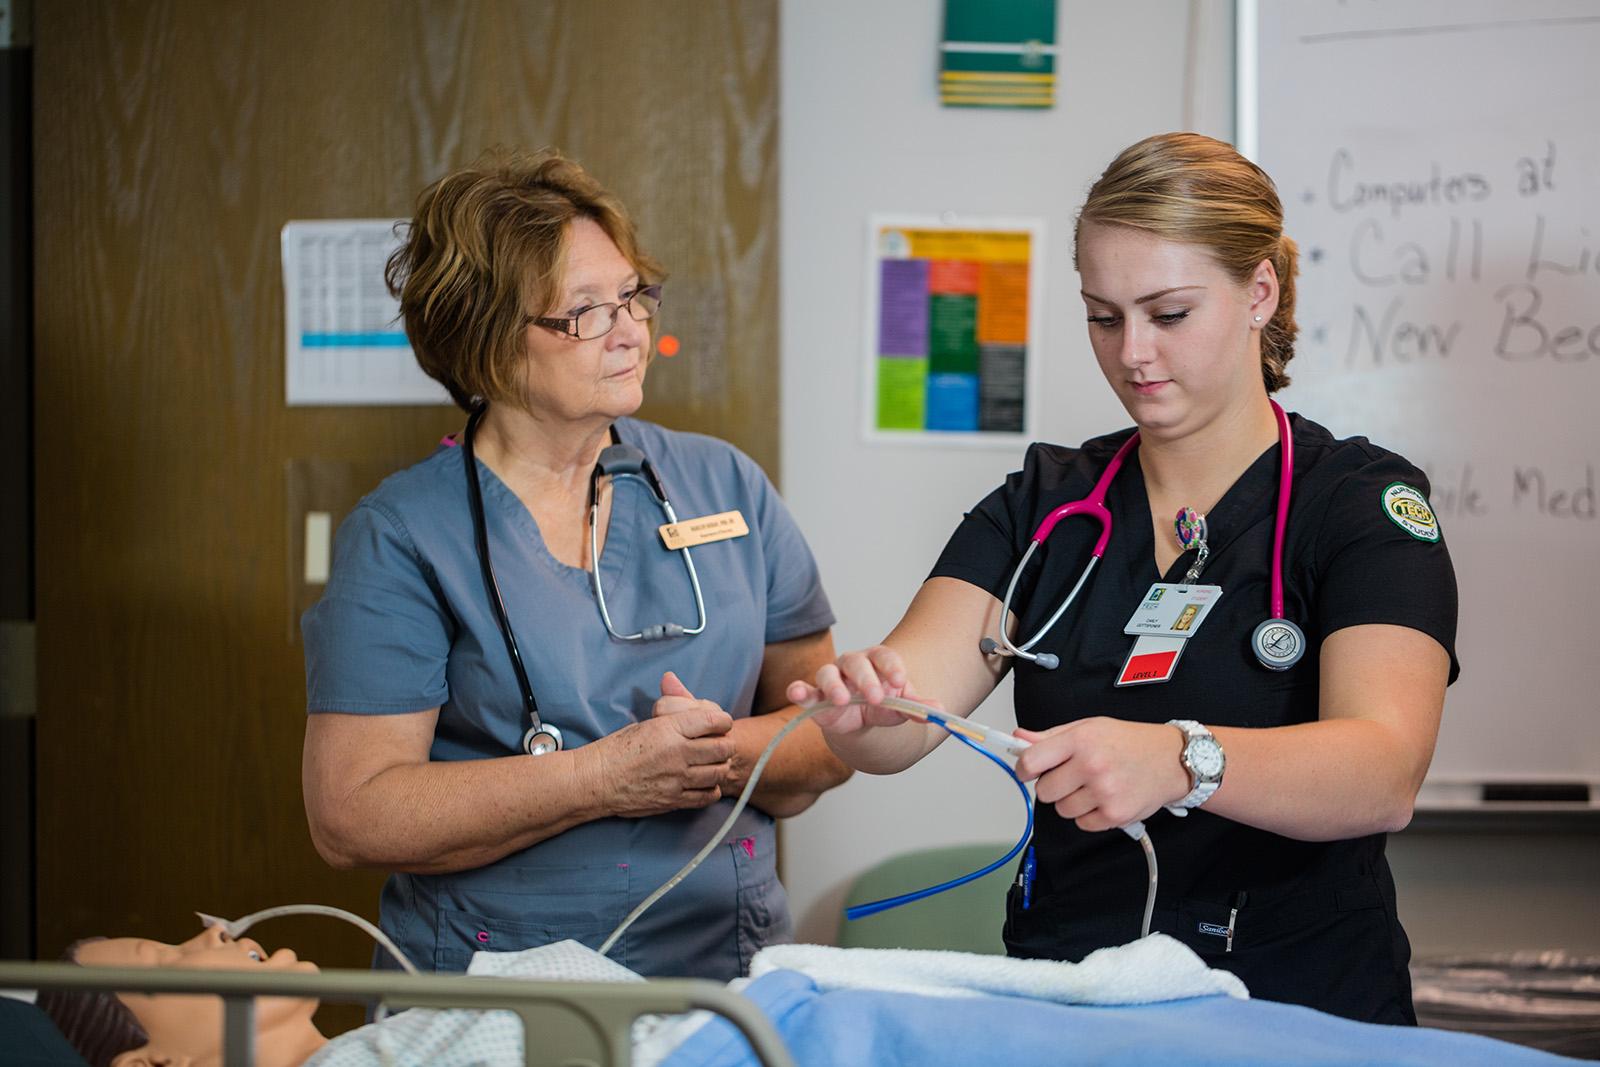 Nursing Students in Skills Class